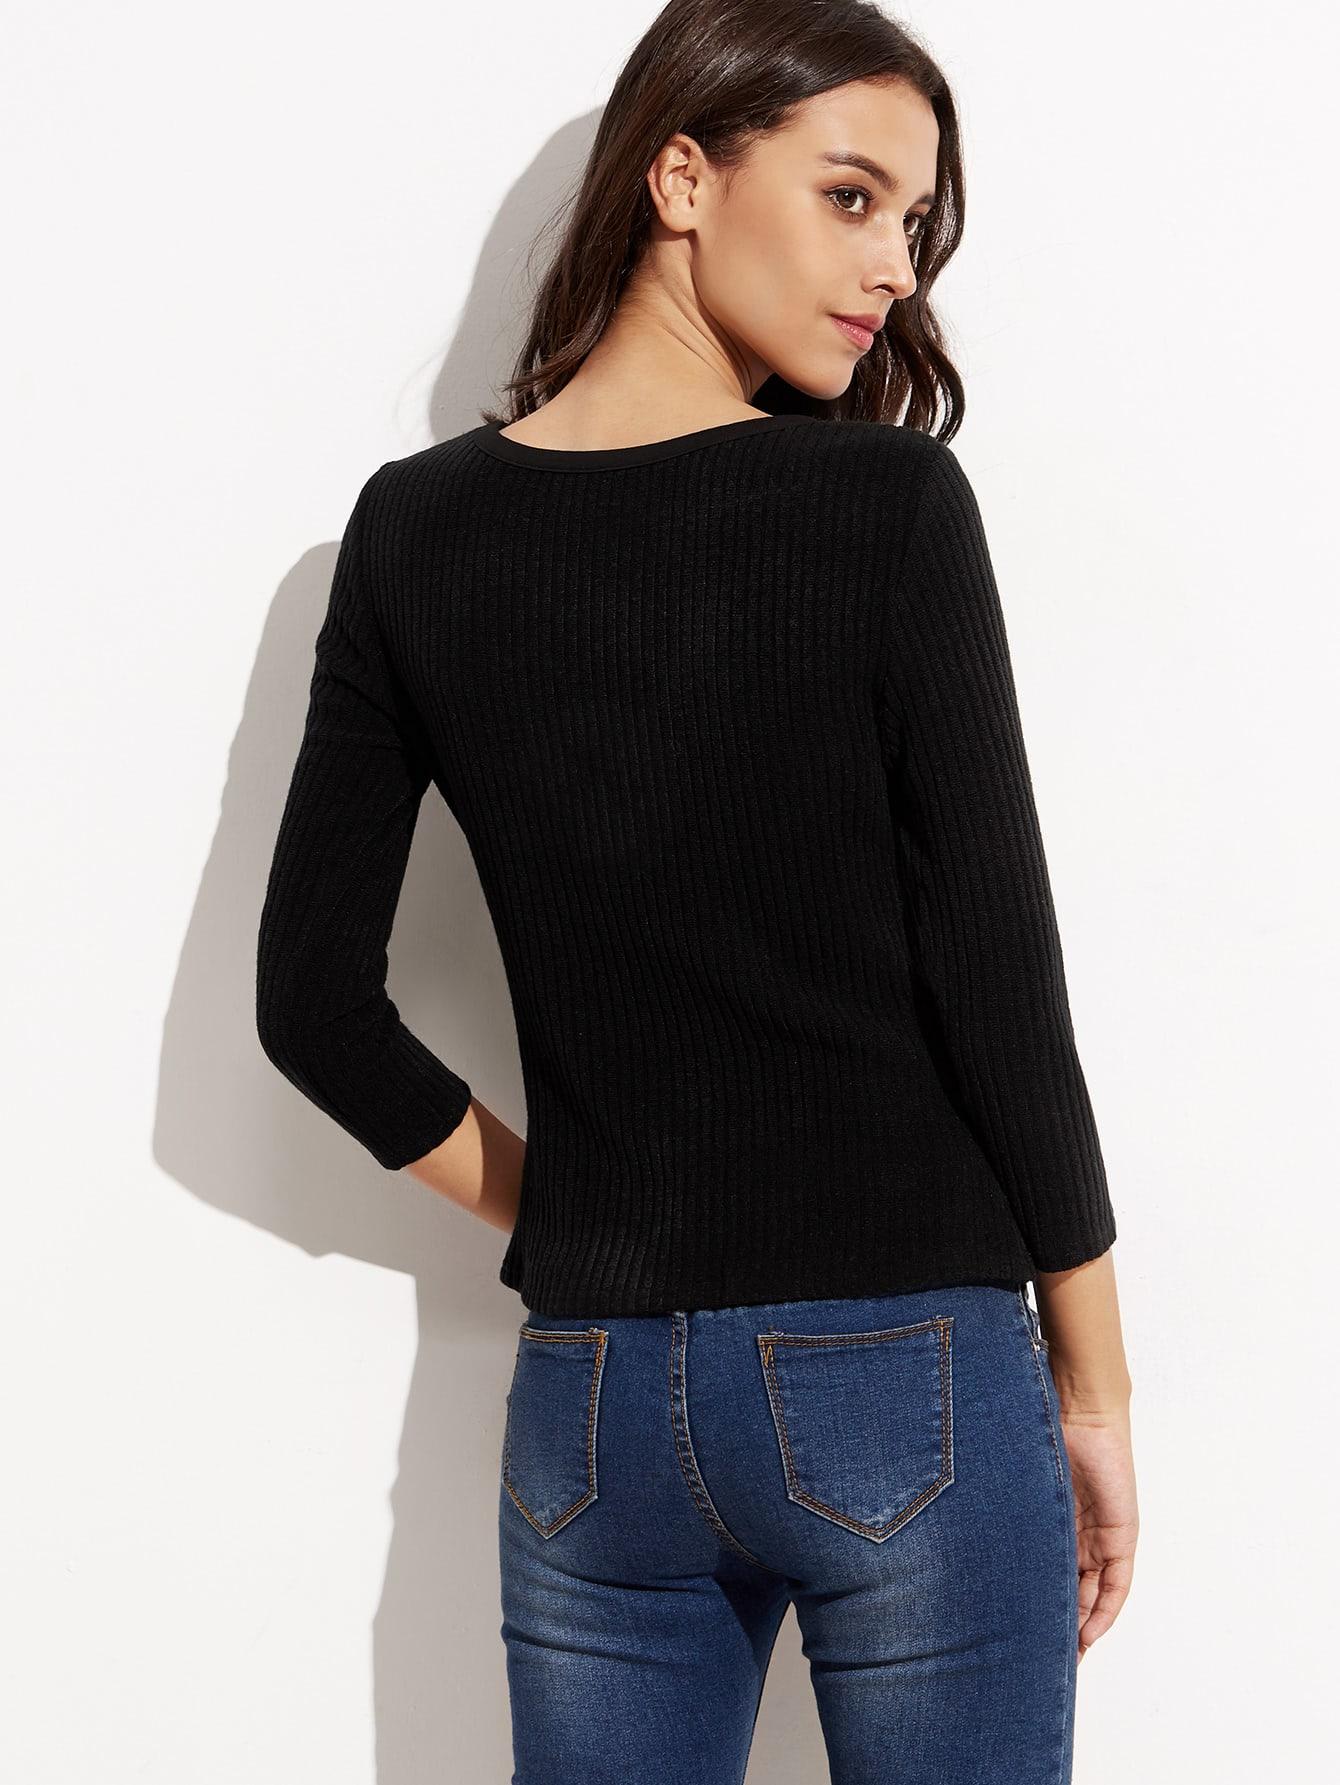 Black Lace Up V Neck Ribbed T-shirt